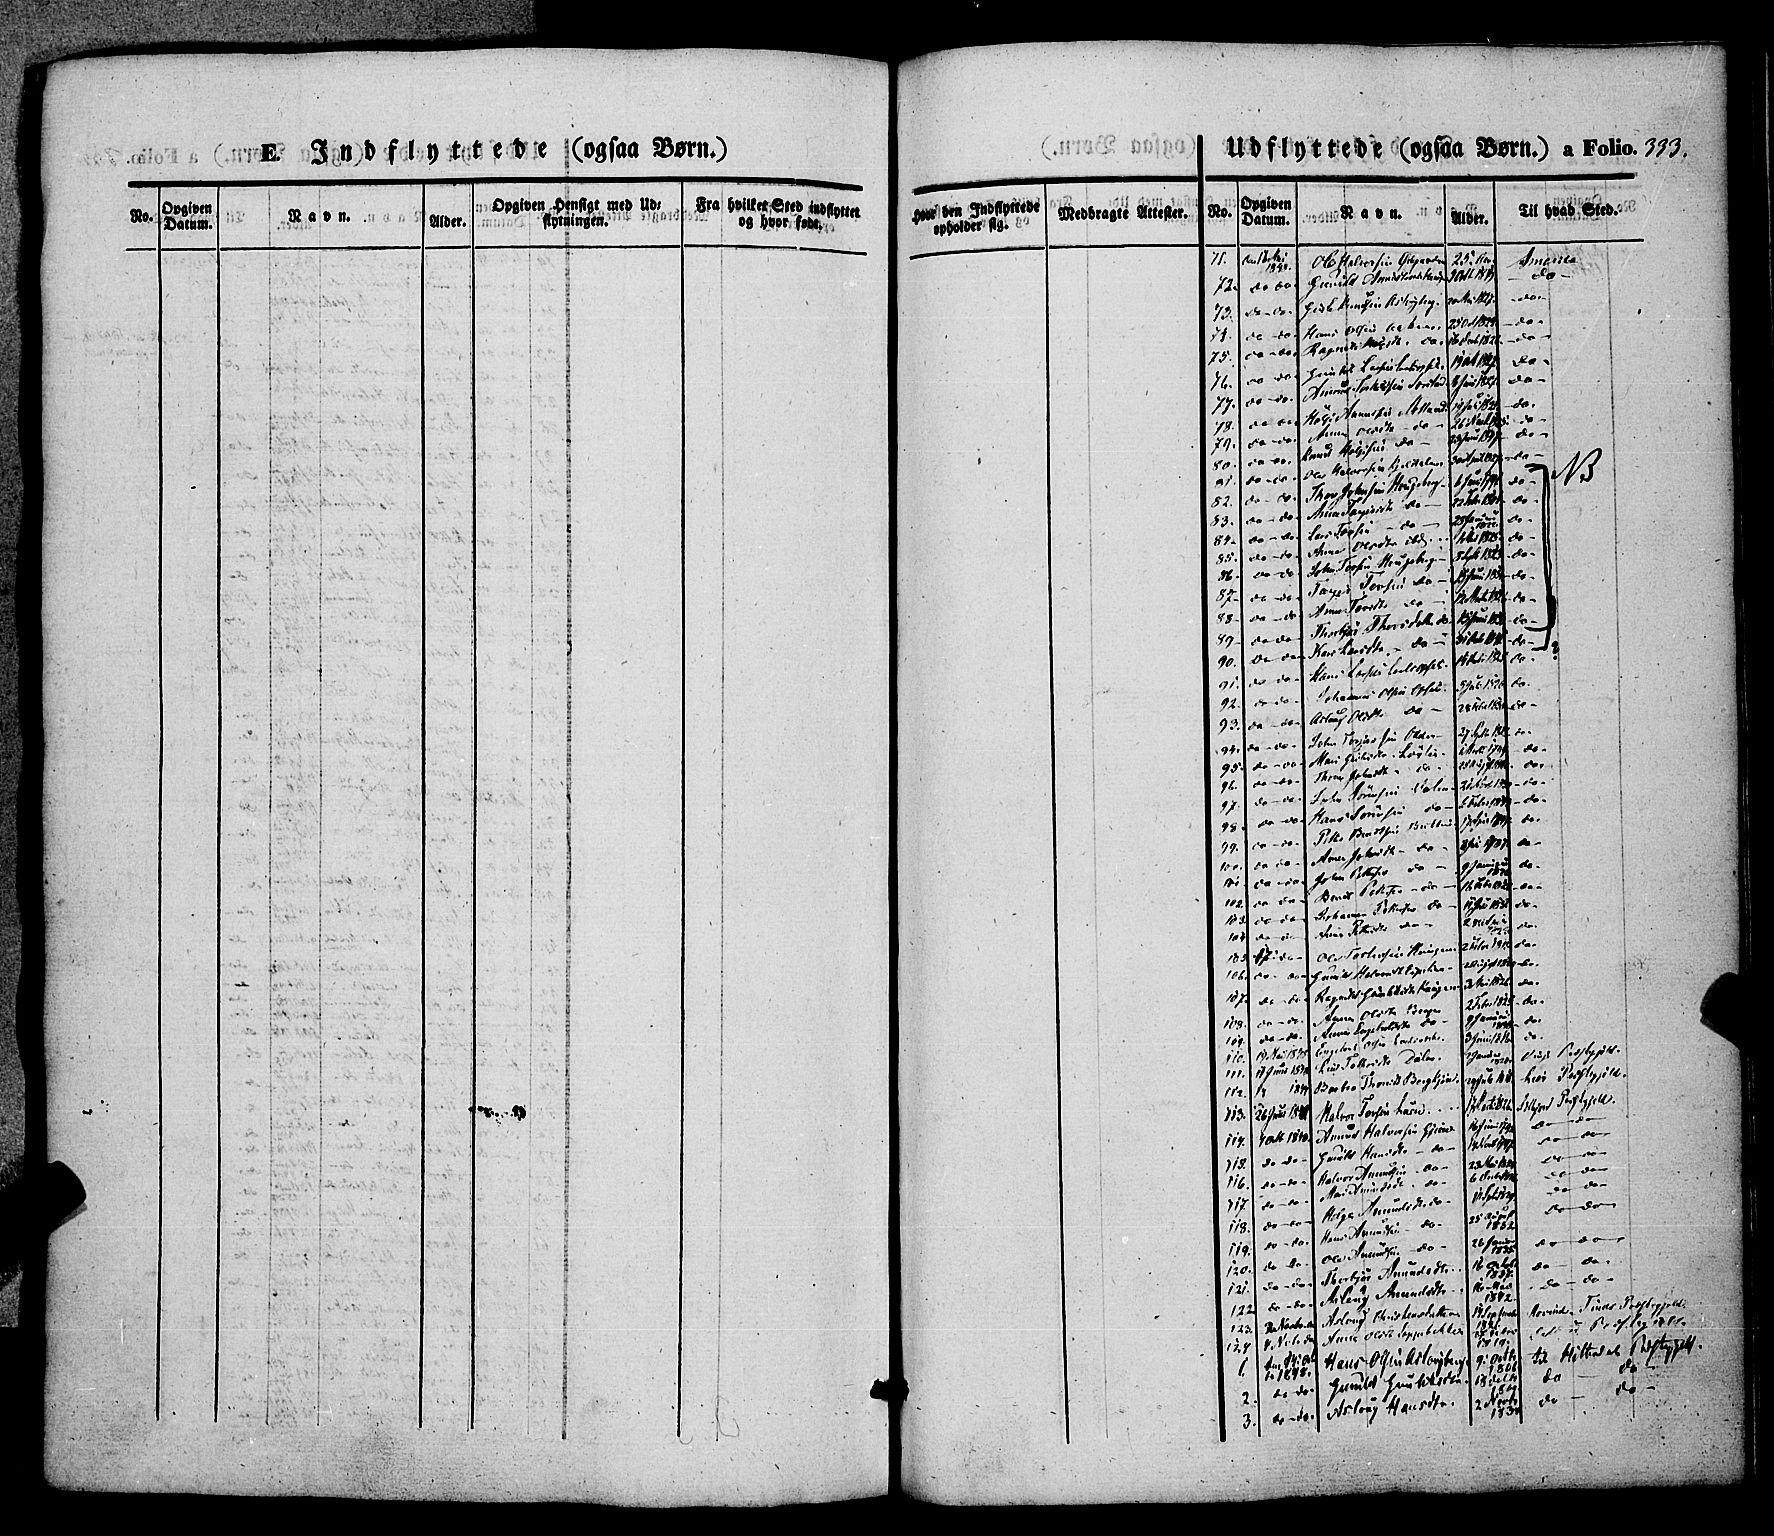 SAKO, Hjartdal kirkebøker, F/Fa/L0008: Ministerialbok nr. I 8, 1844-1859, s. 333